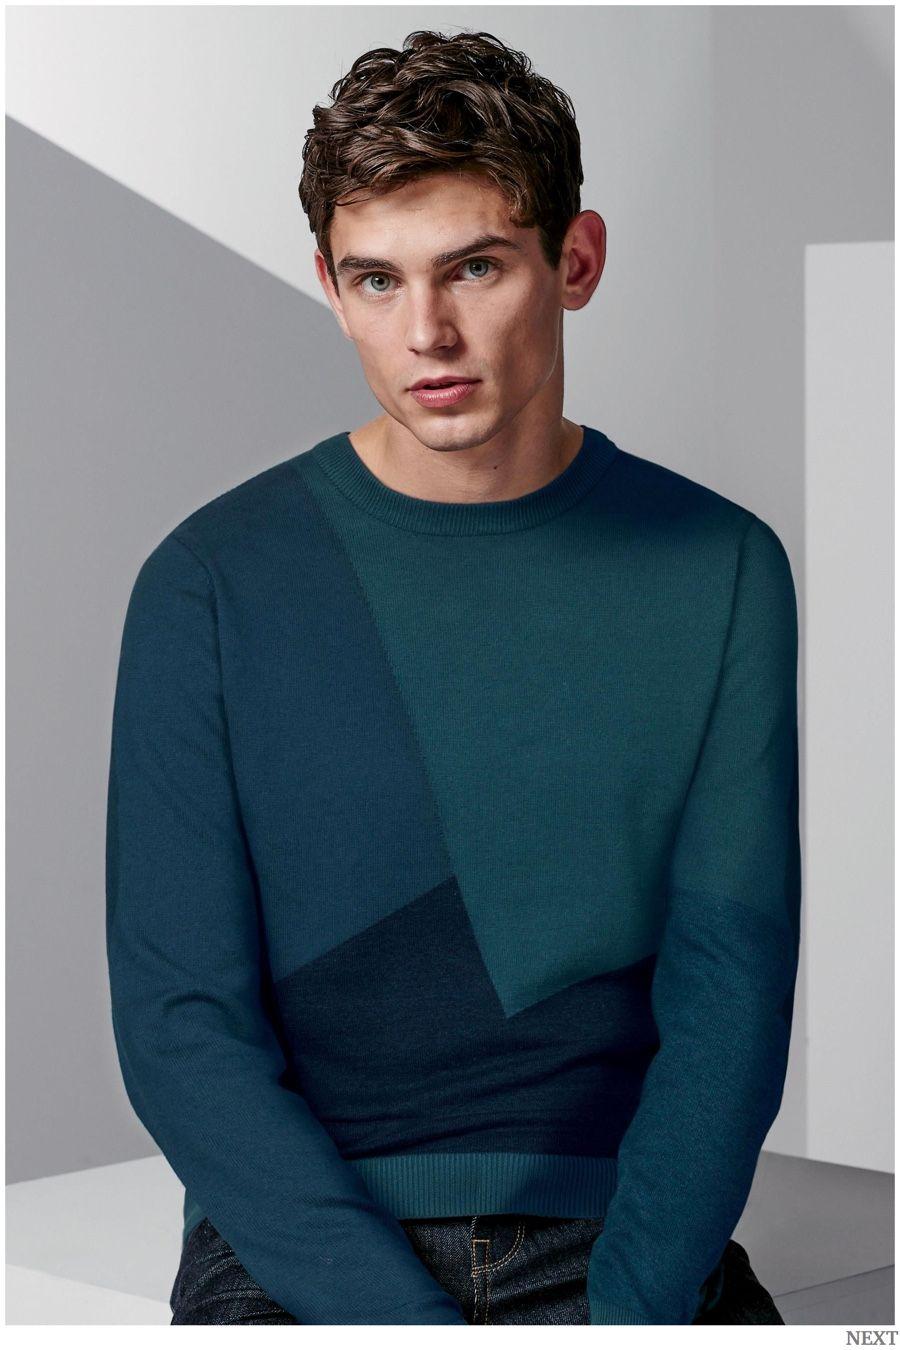 b2a240f31f1f Graphic Focus: Next Knitwear + Trendy Sweatshirts | Men's | Graphic ...